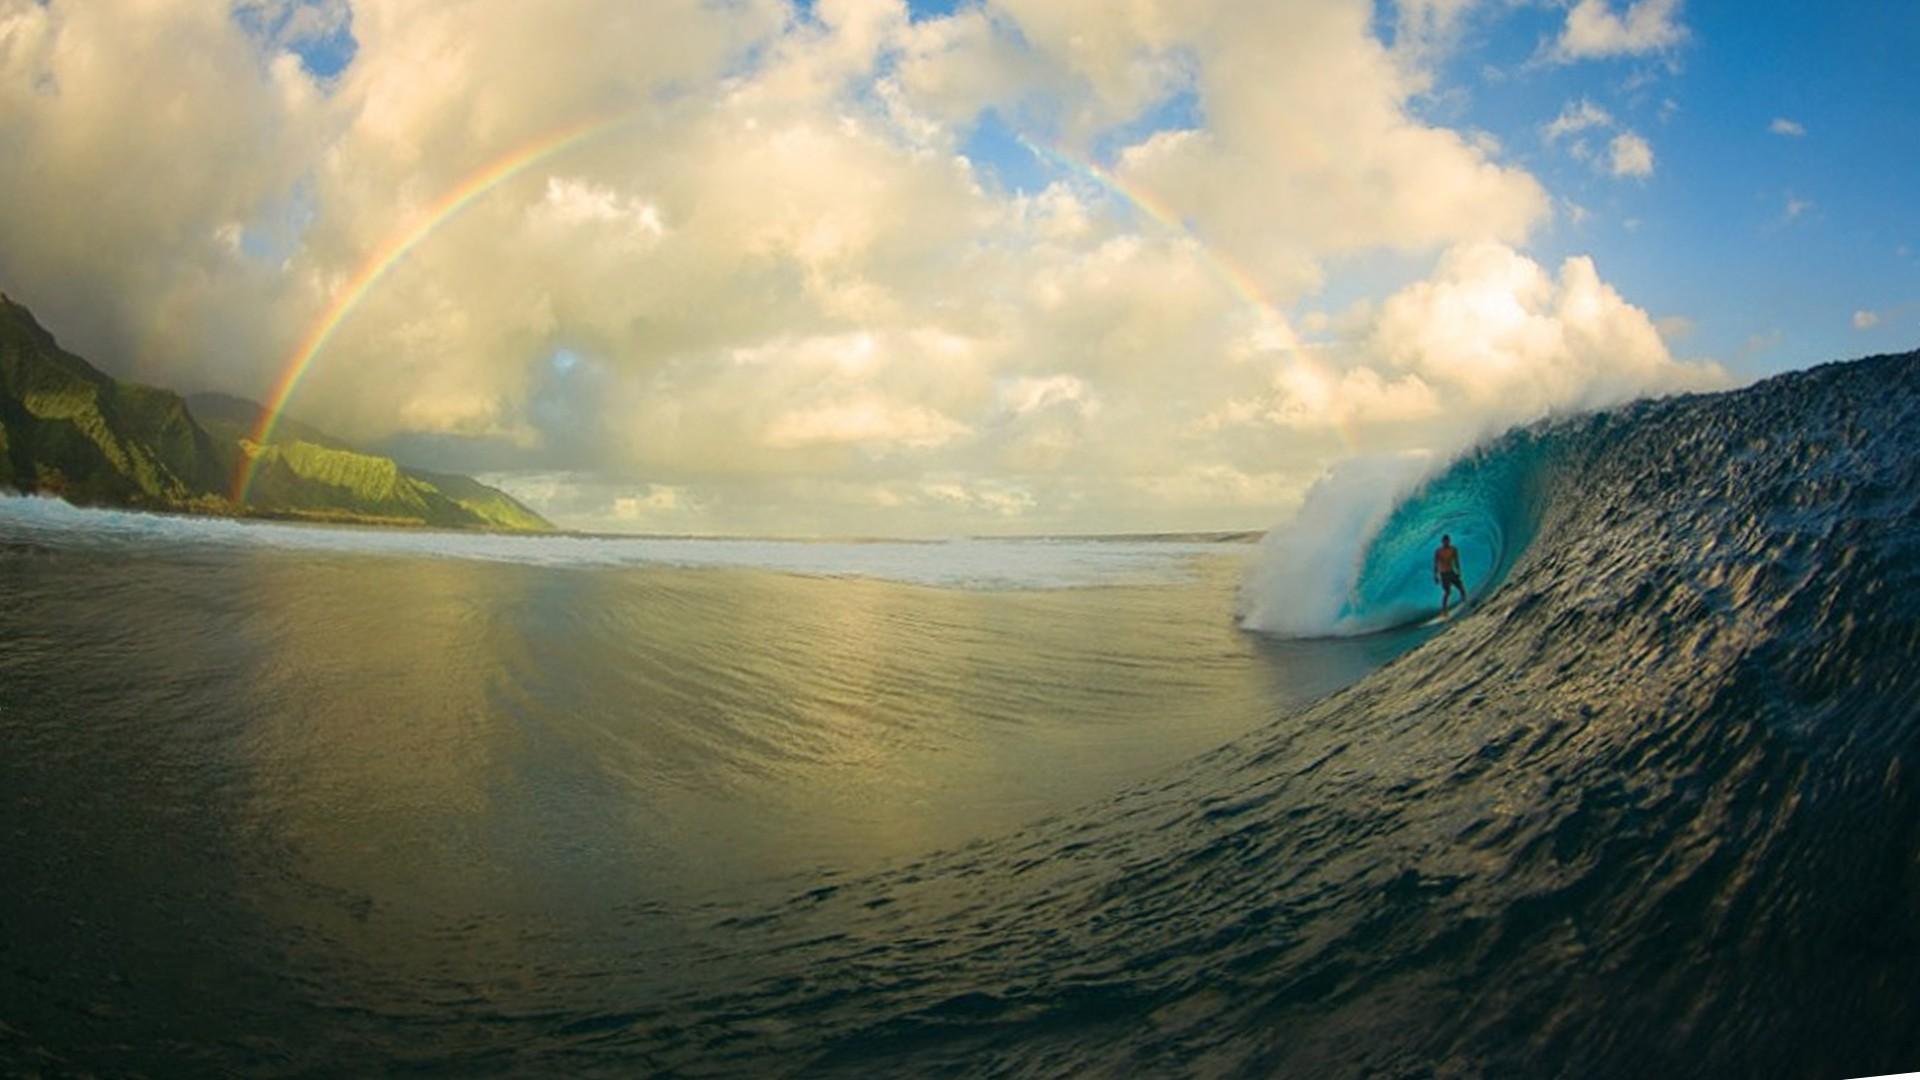 Surfing Rainbows #21662 Wallpaper | Wallpaper hd